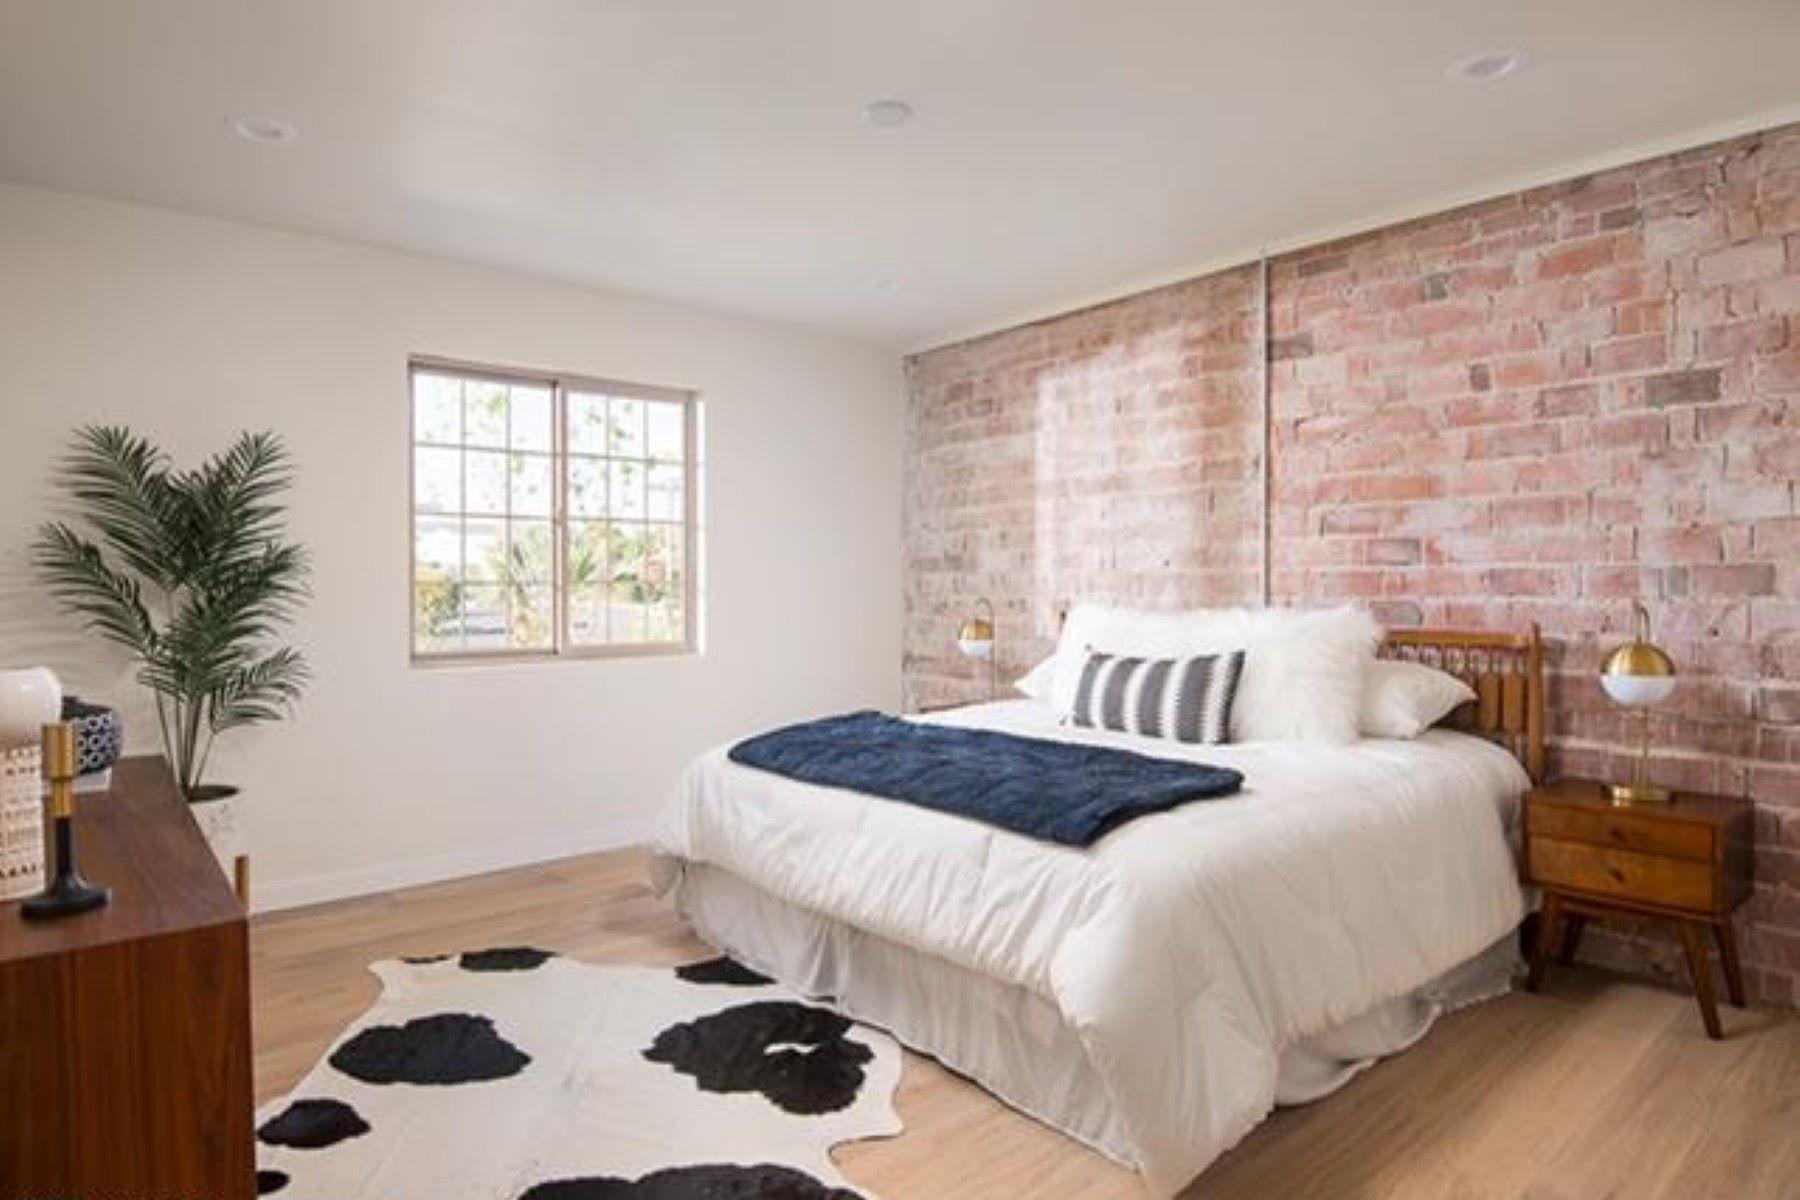 Single Family Home for Sale at beautifully remodeled property in Camelback Corridor 3131 E Highland Ave Phoenix, Arizona, 85016 United States